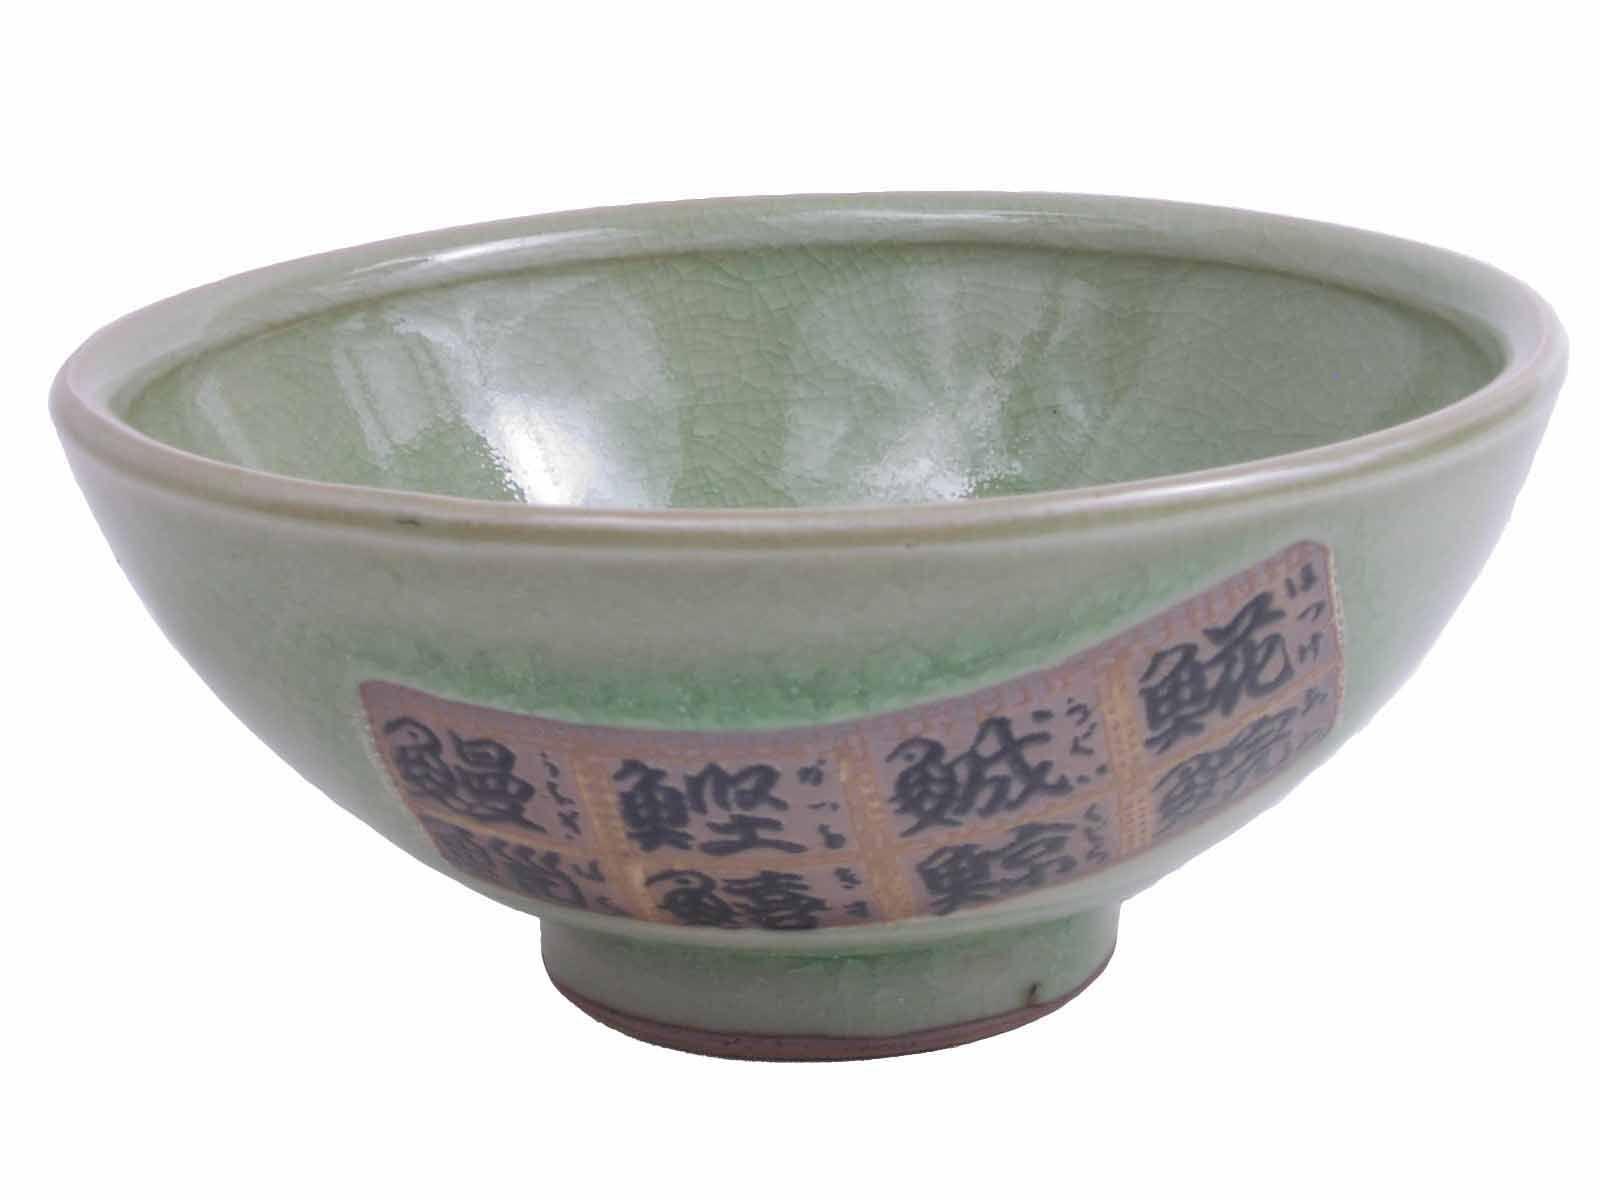 Multiple Fishes Rice Bowl Japanese Rice Bowl Bowl Chopstick Rest